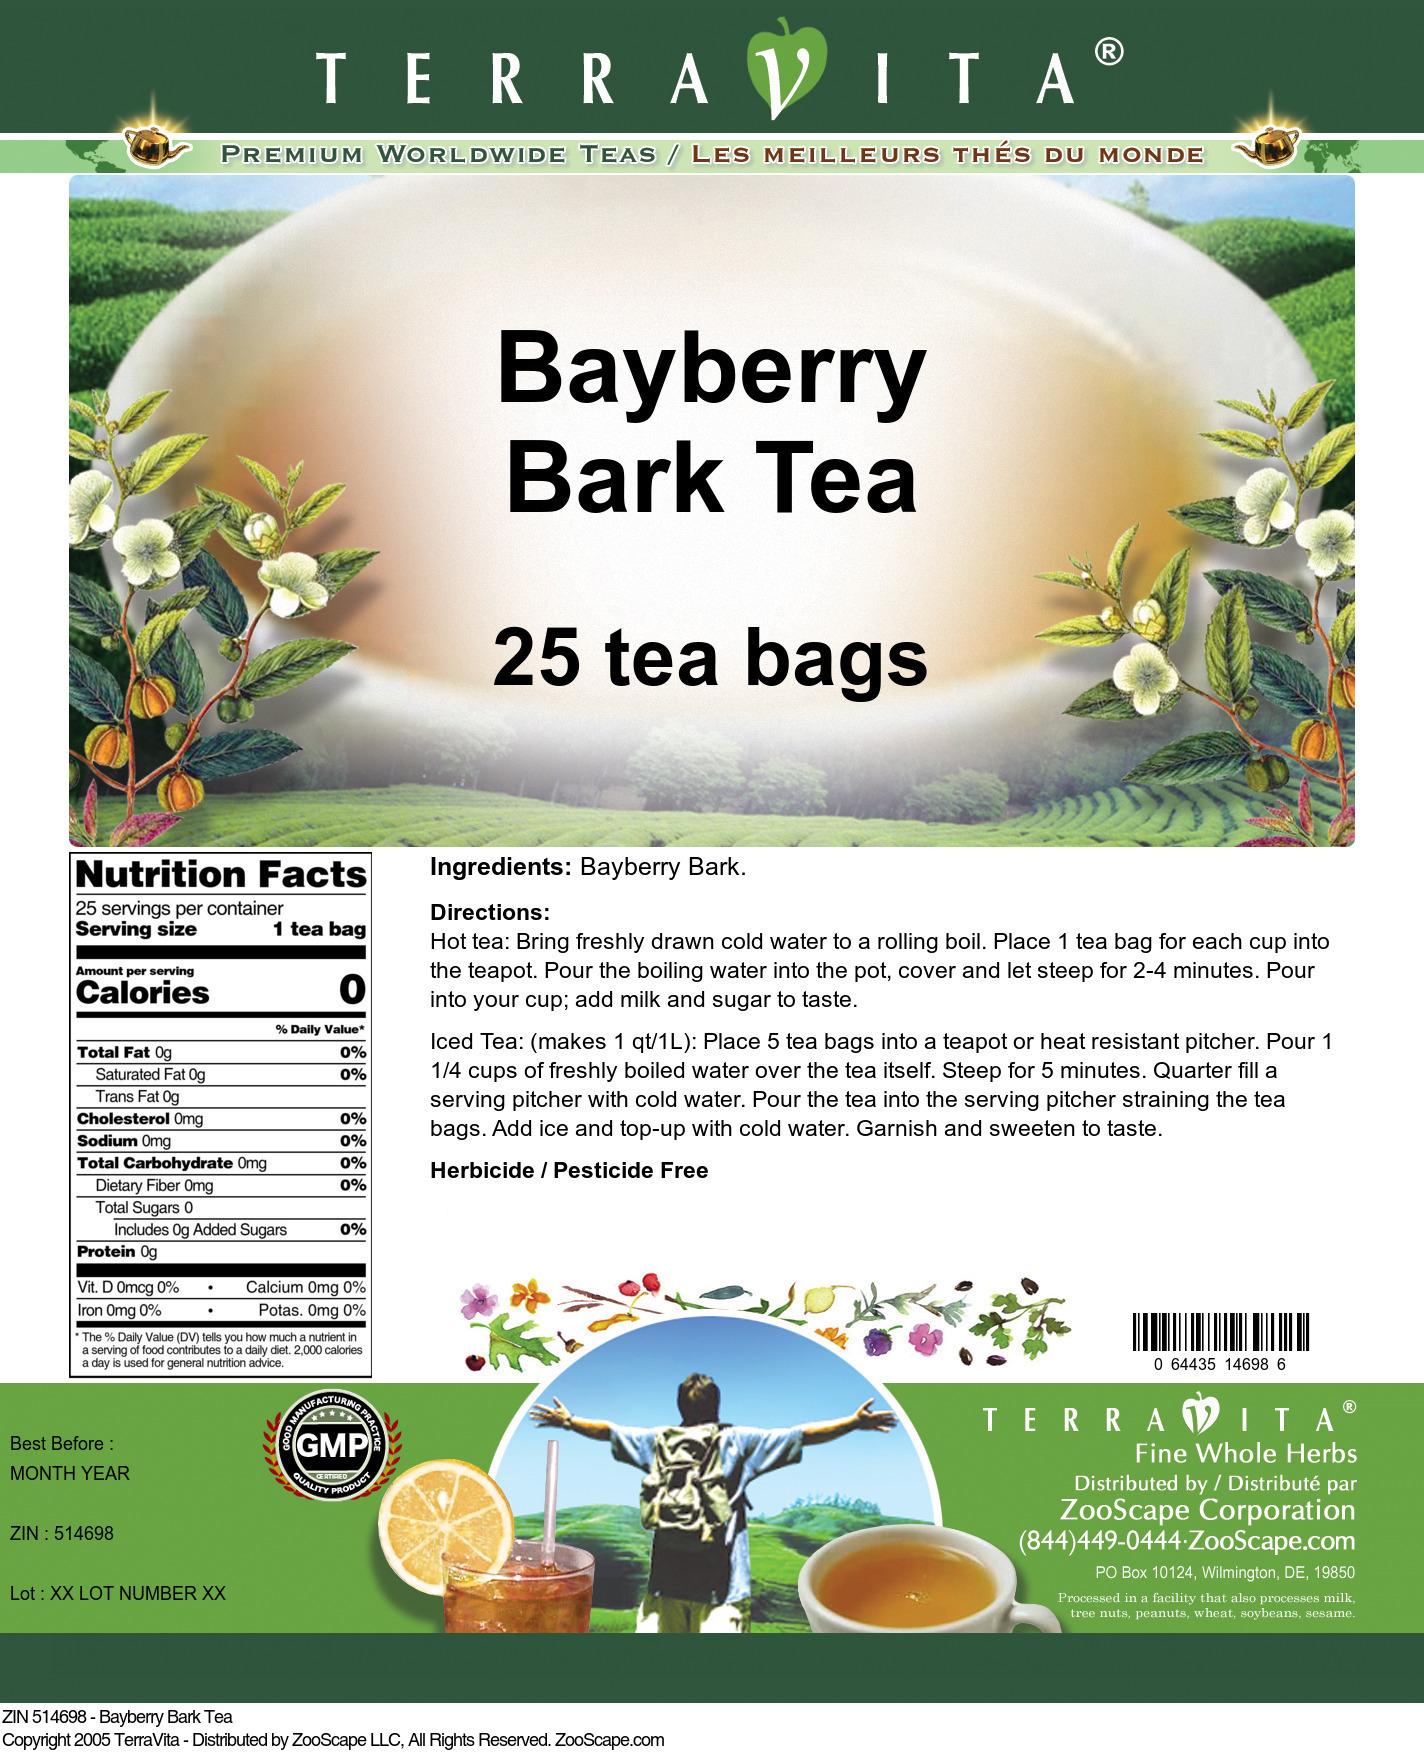 Bayberry Bark